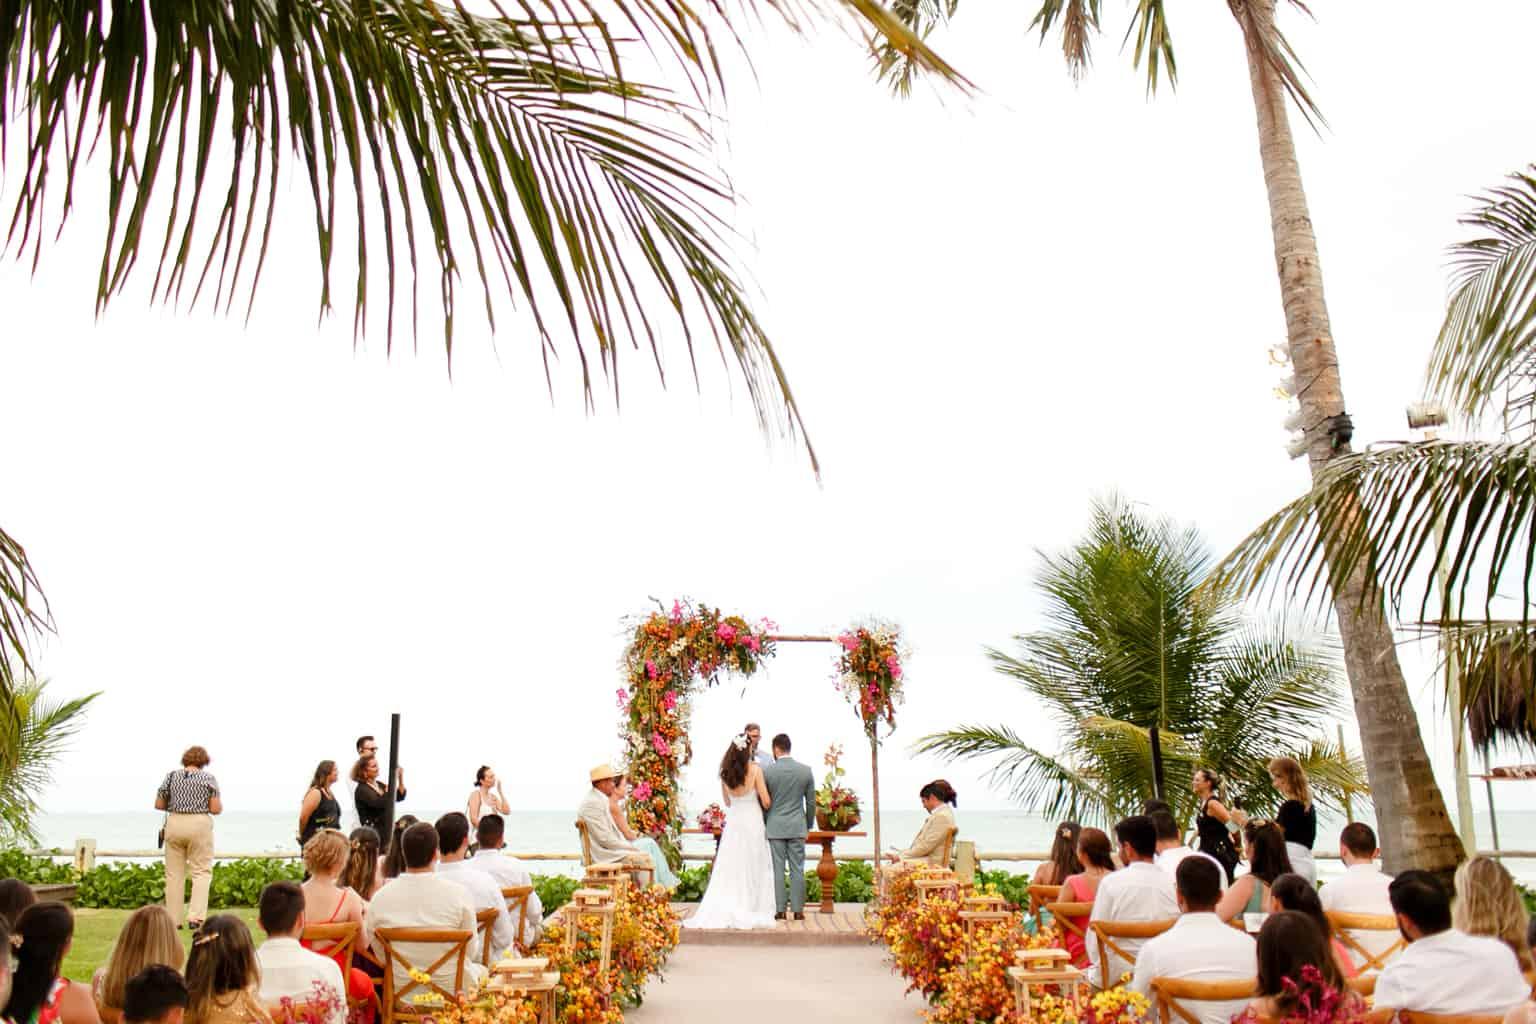 Casamento-Emanuelle-e-Alysson-Fotografia-Tadeu-Nanó-e-Luca-Antunes94